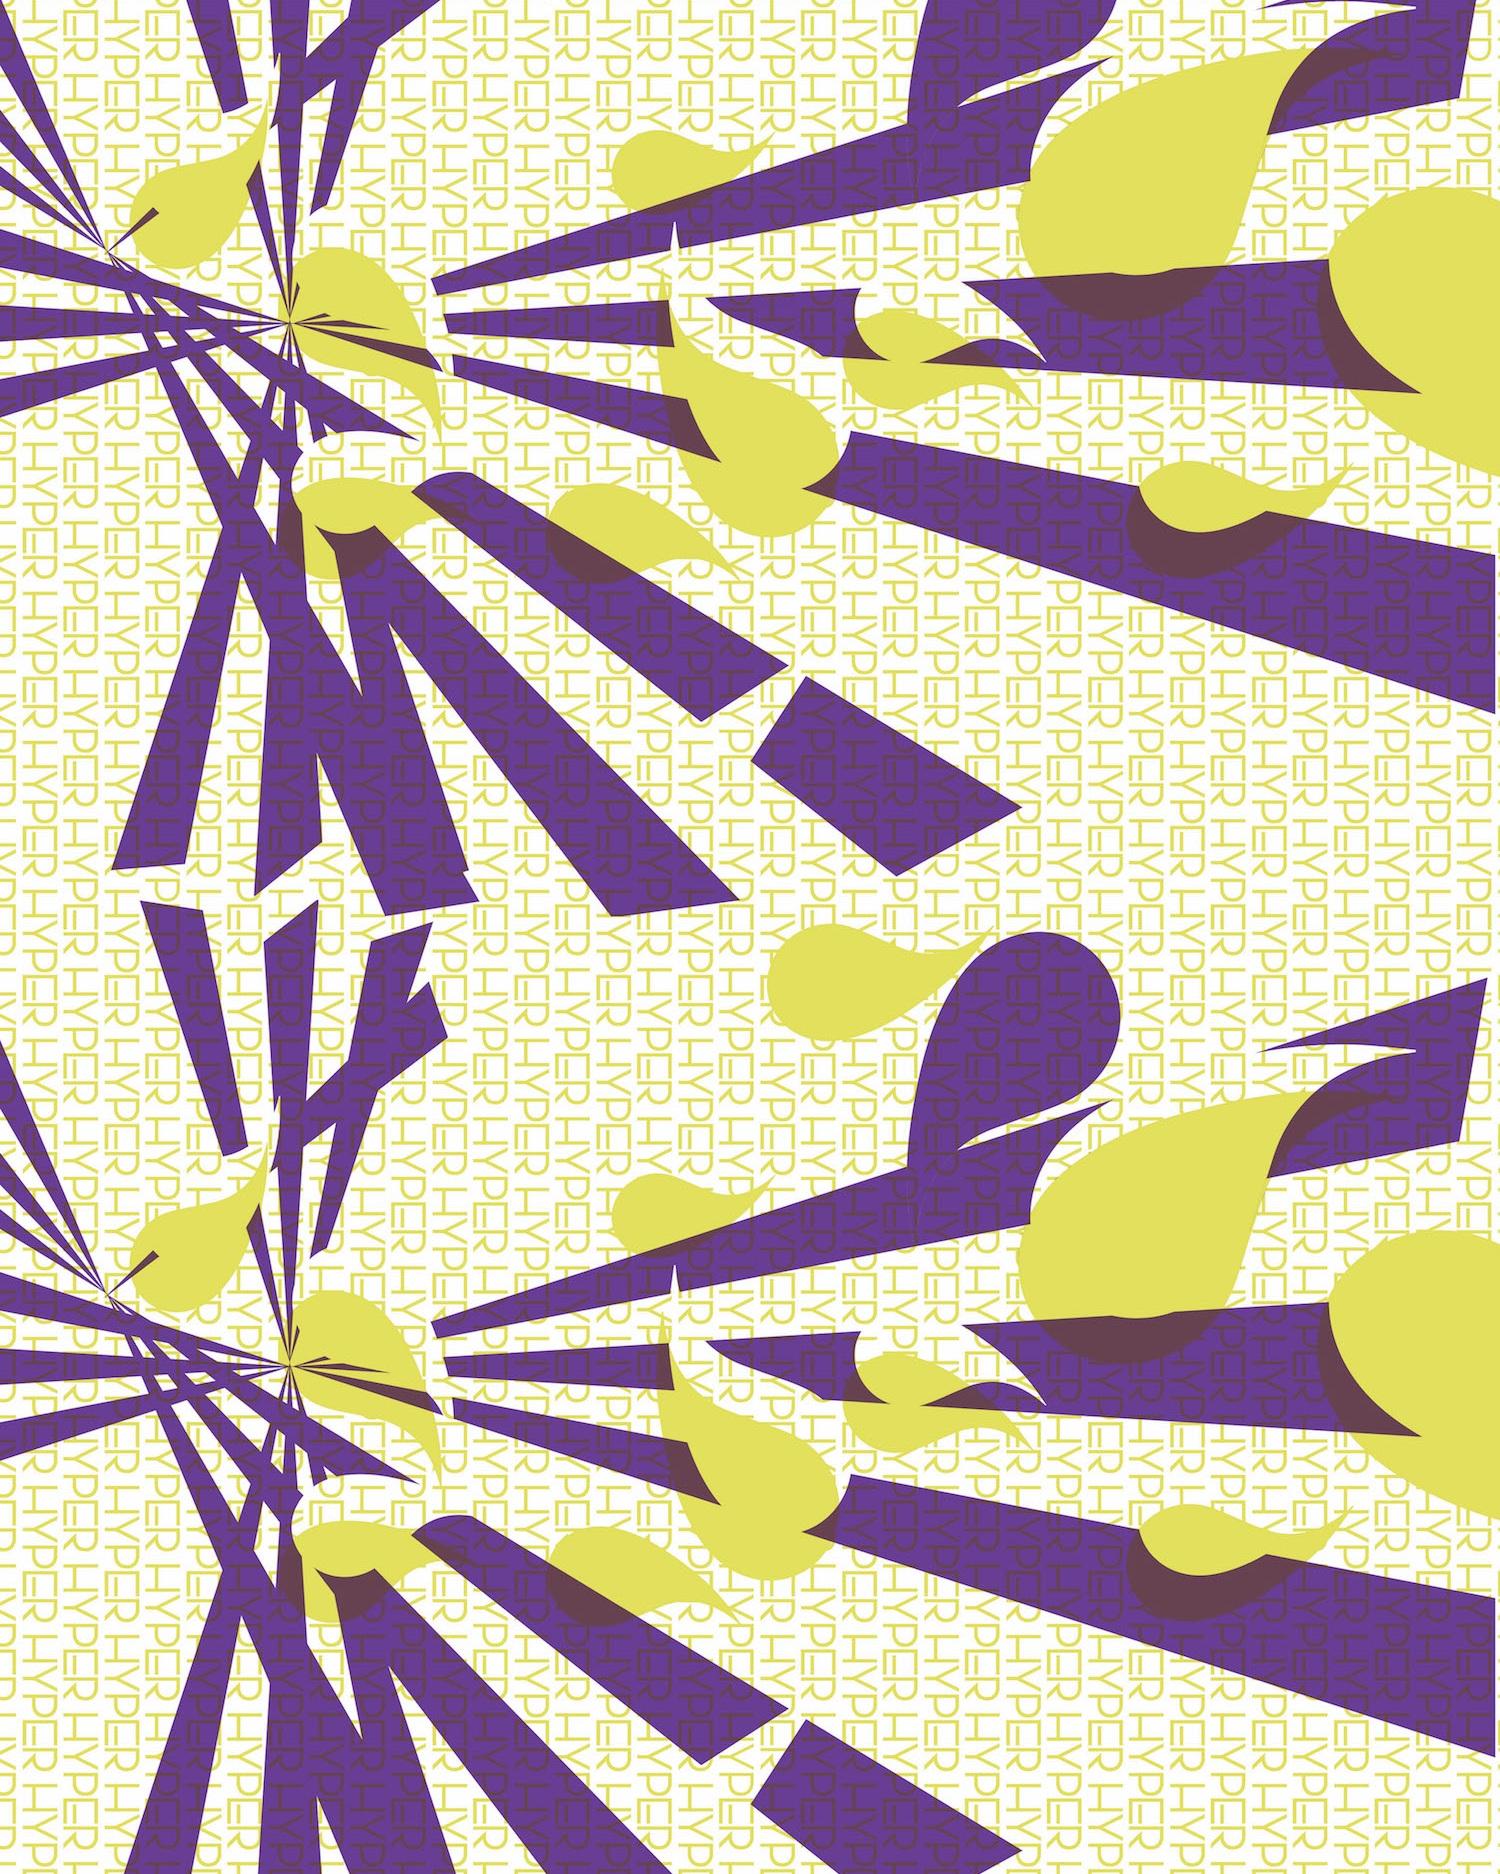 jadesign-hyper-06.jpg